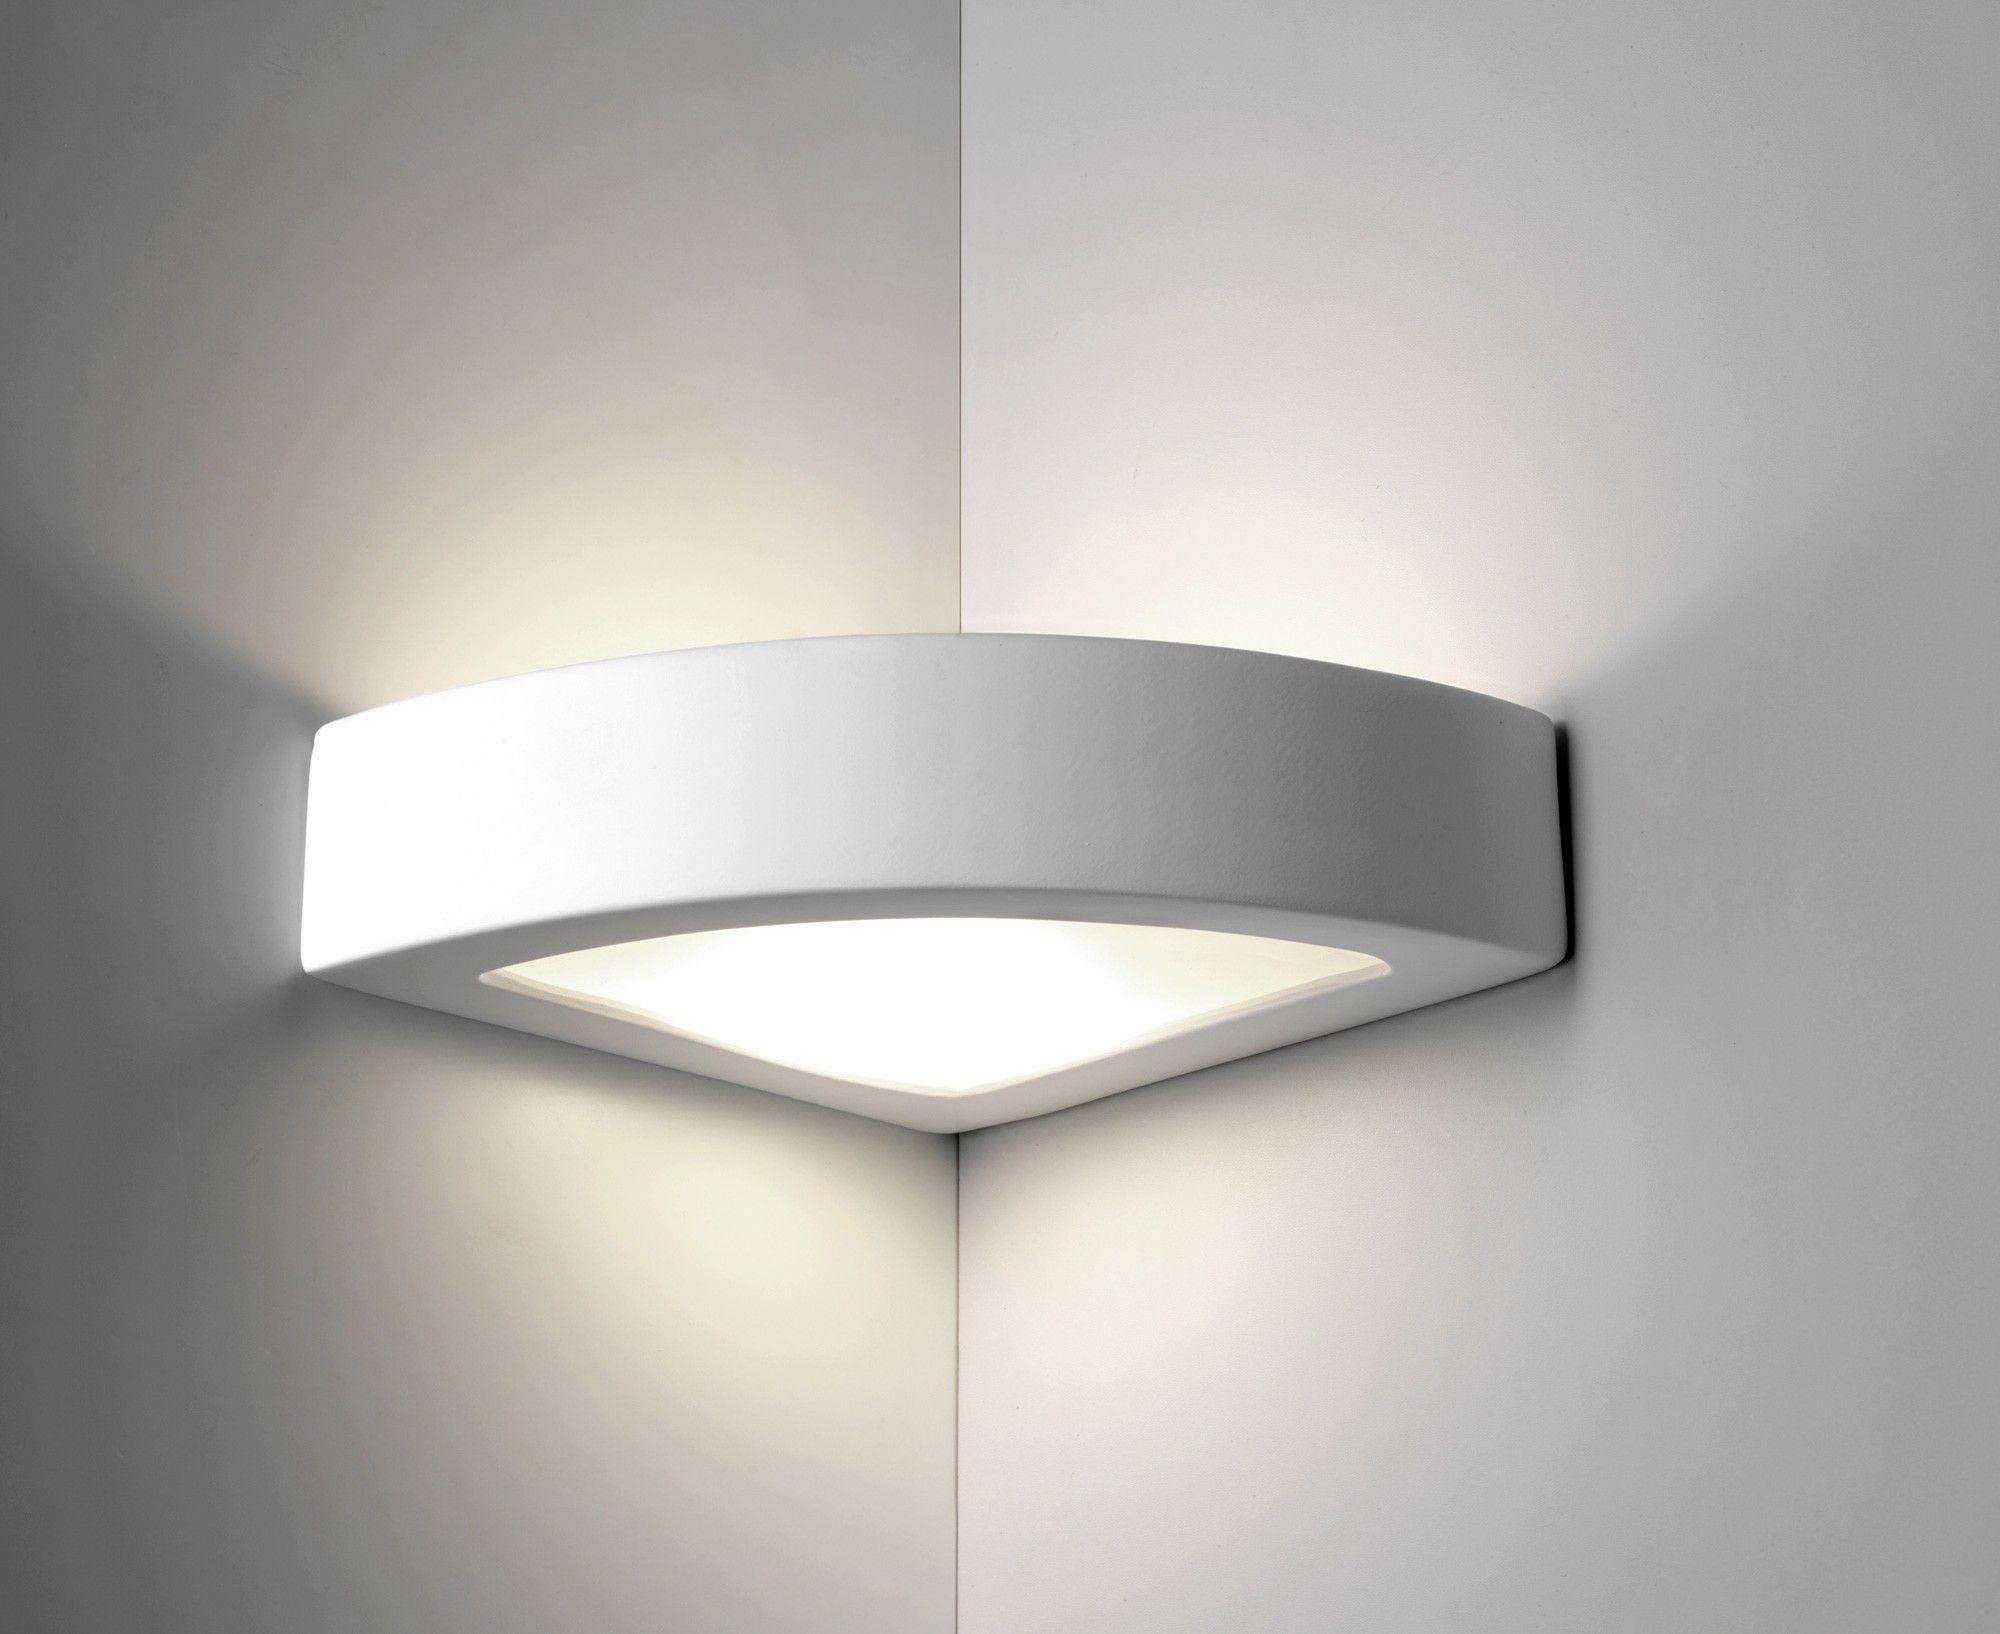 Wandlampe Aus Gips 8056 Von Belfiore Lampe Wandlampe Keramik Lampen